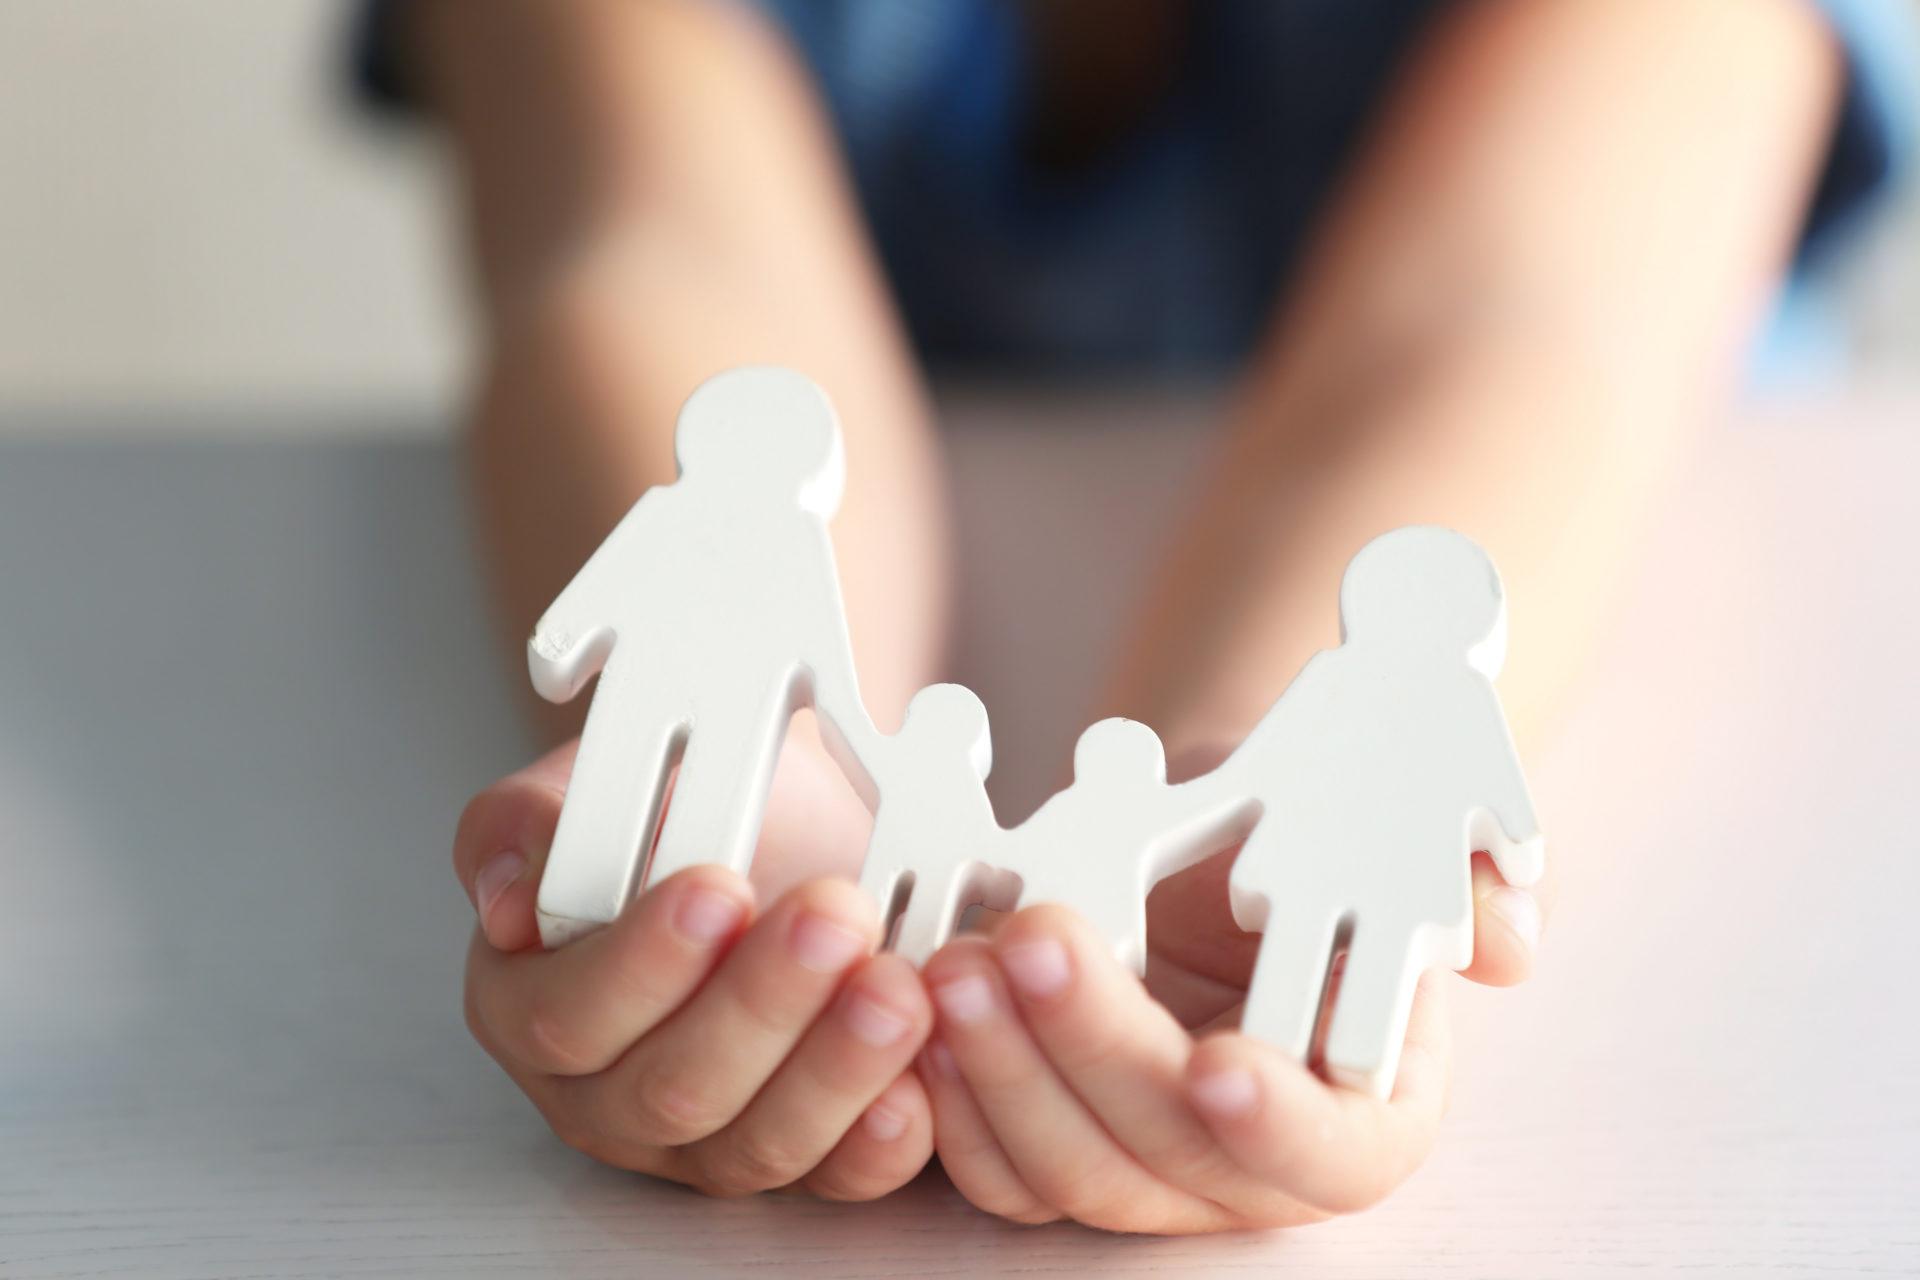 Parenting arrangements for children